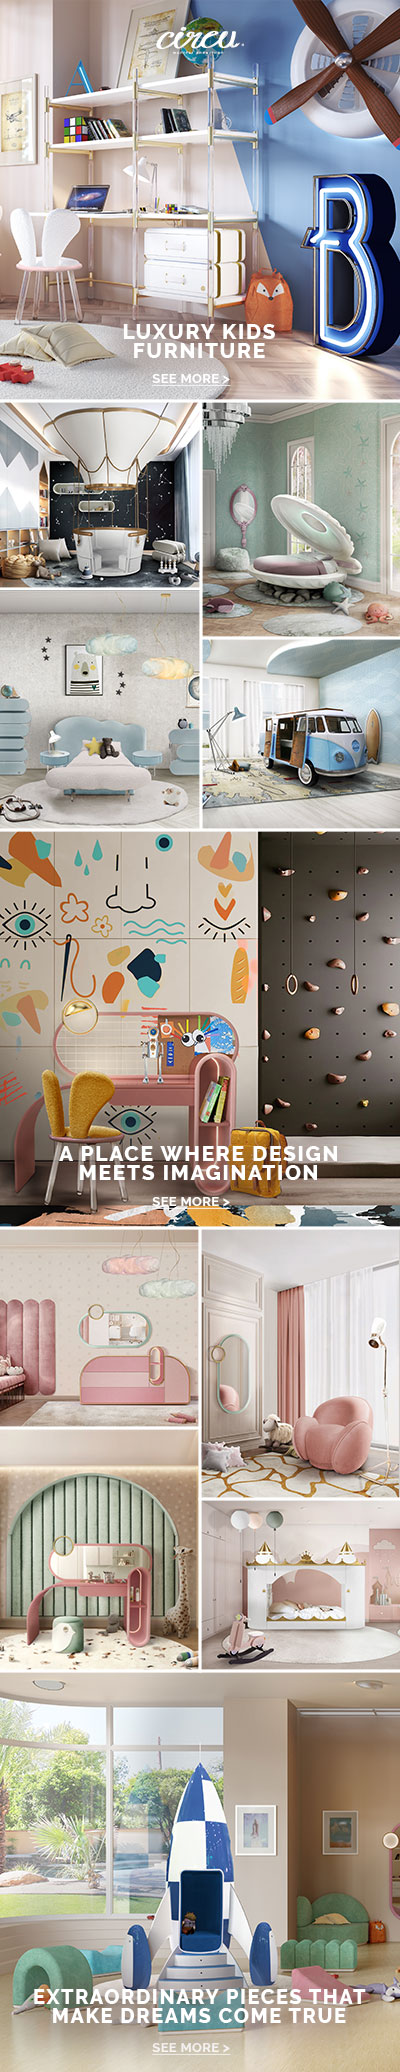 Kids Bedroom Ideas sidebannermoodboardCC 1